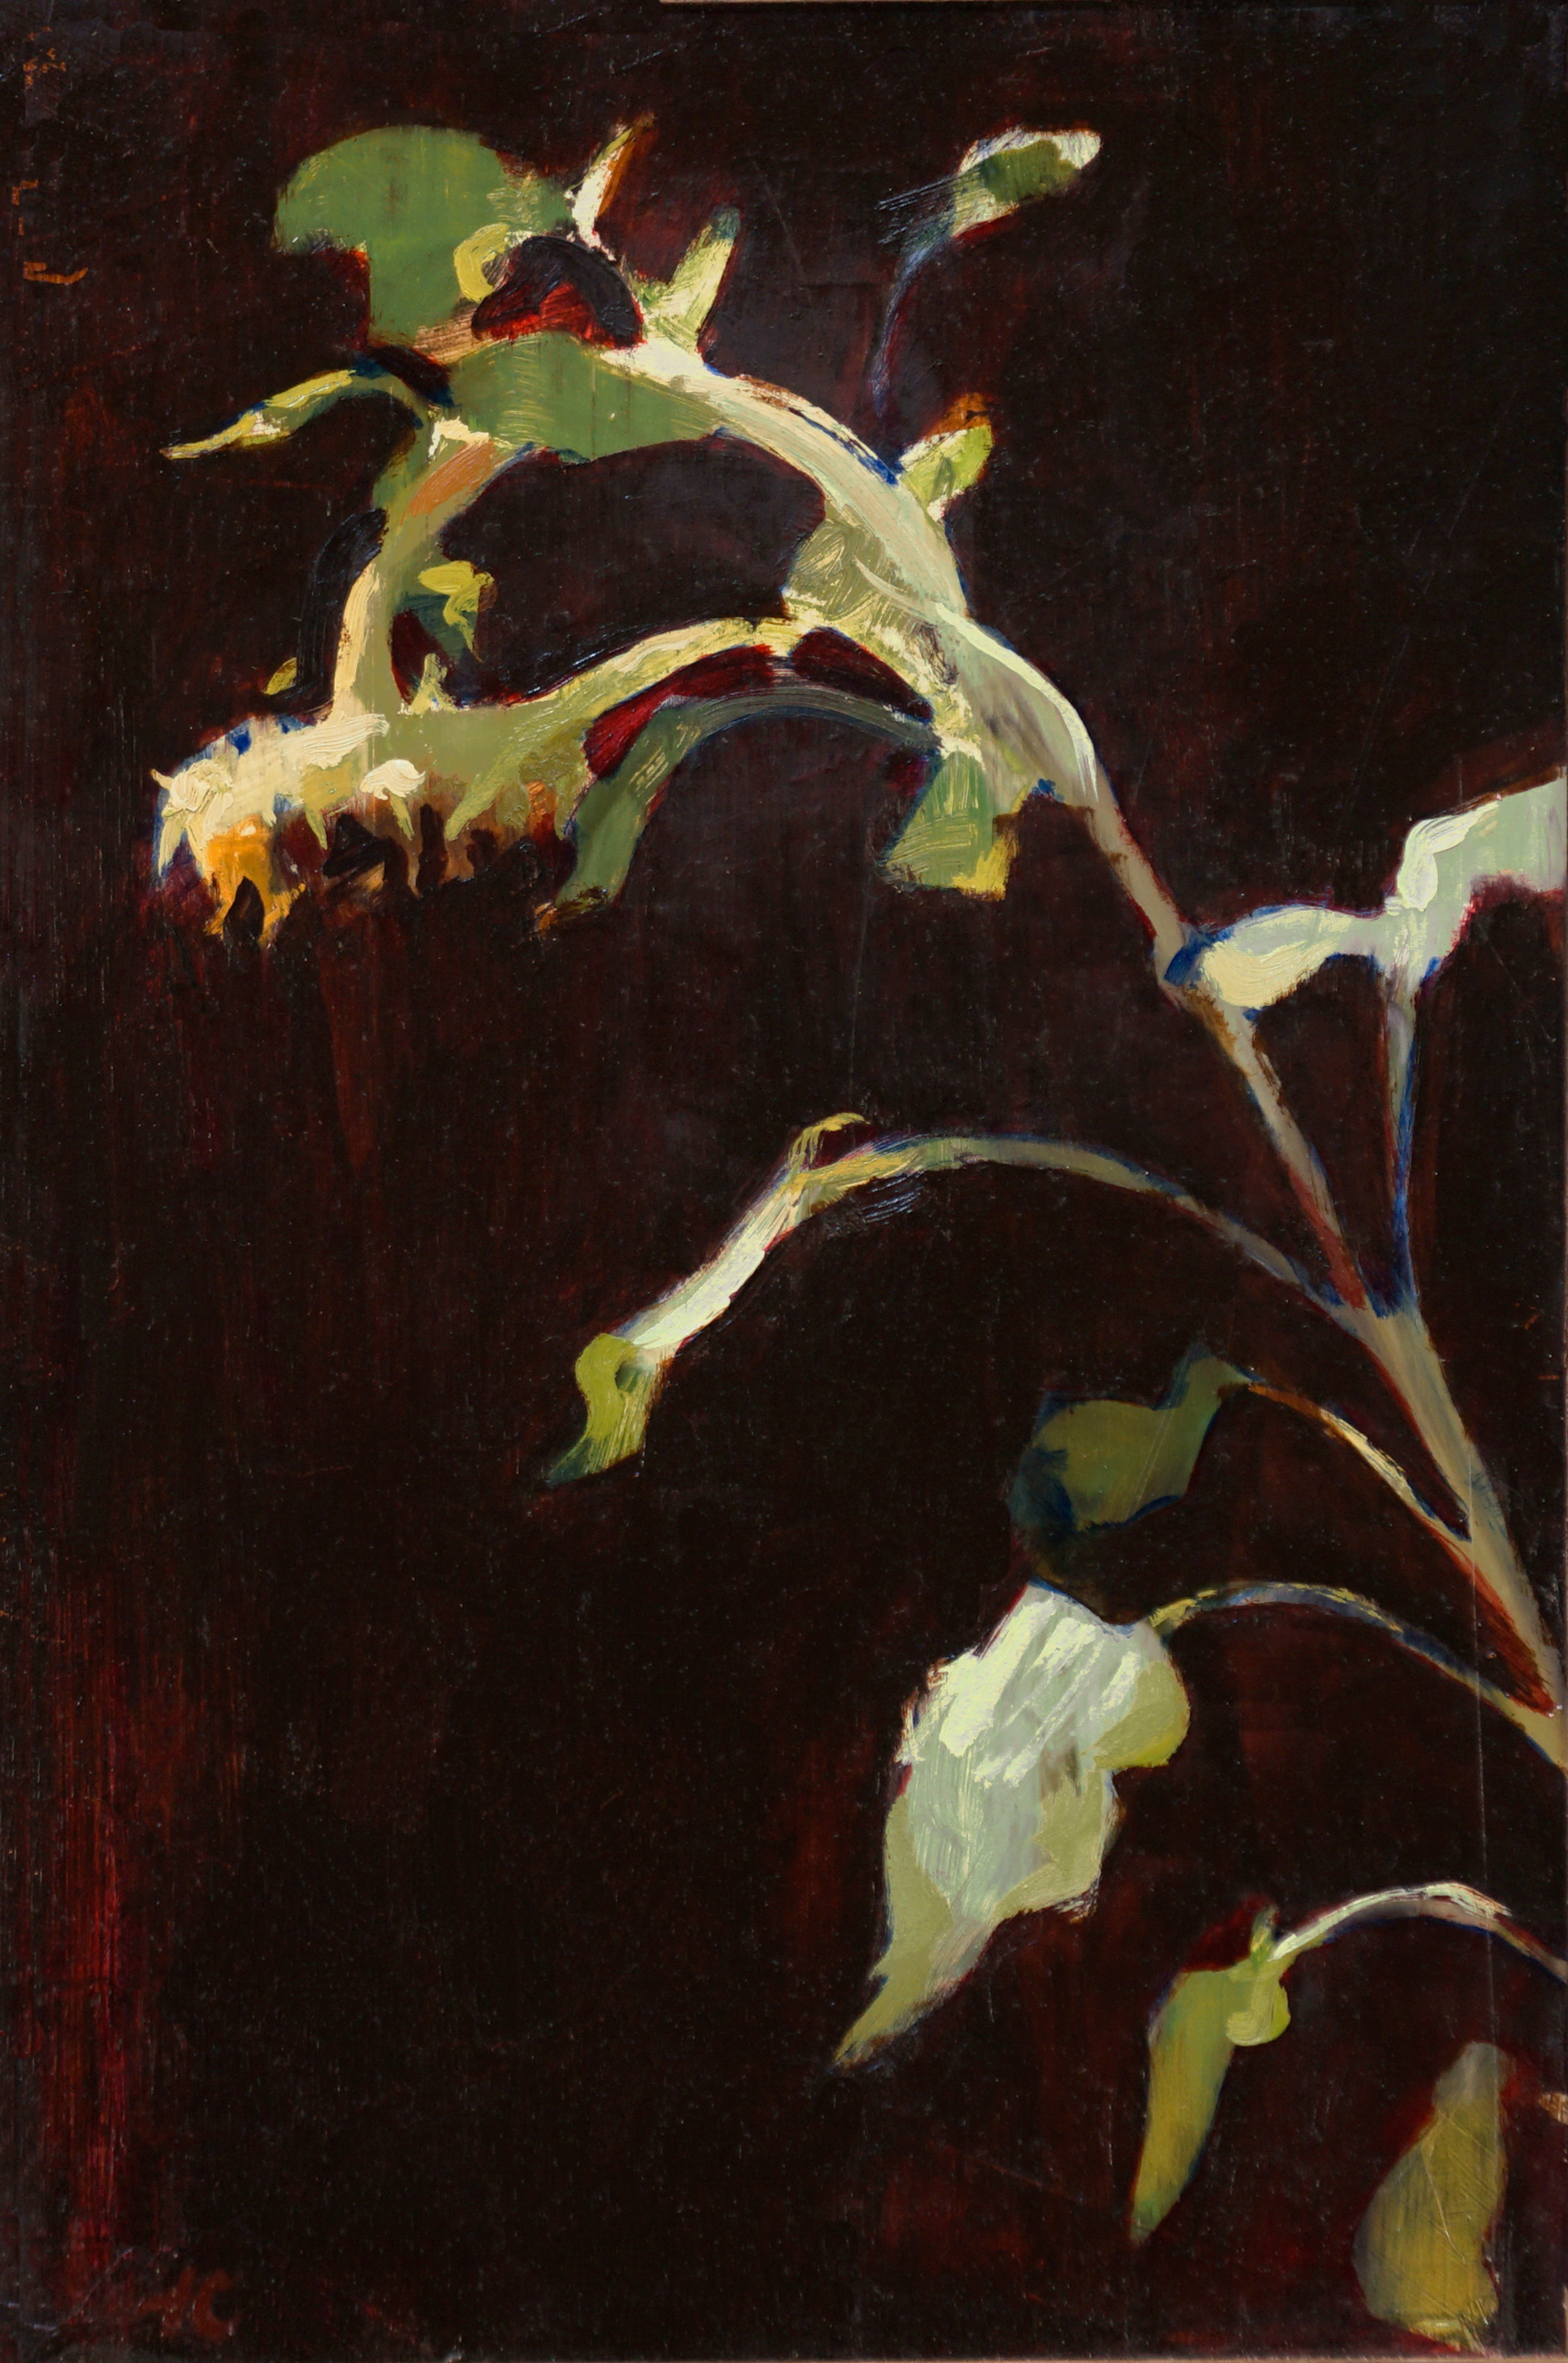 mark-crenshaw-1706-tall-sunflower-with-burgendy-background.jpg